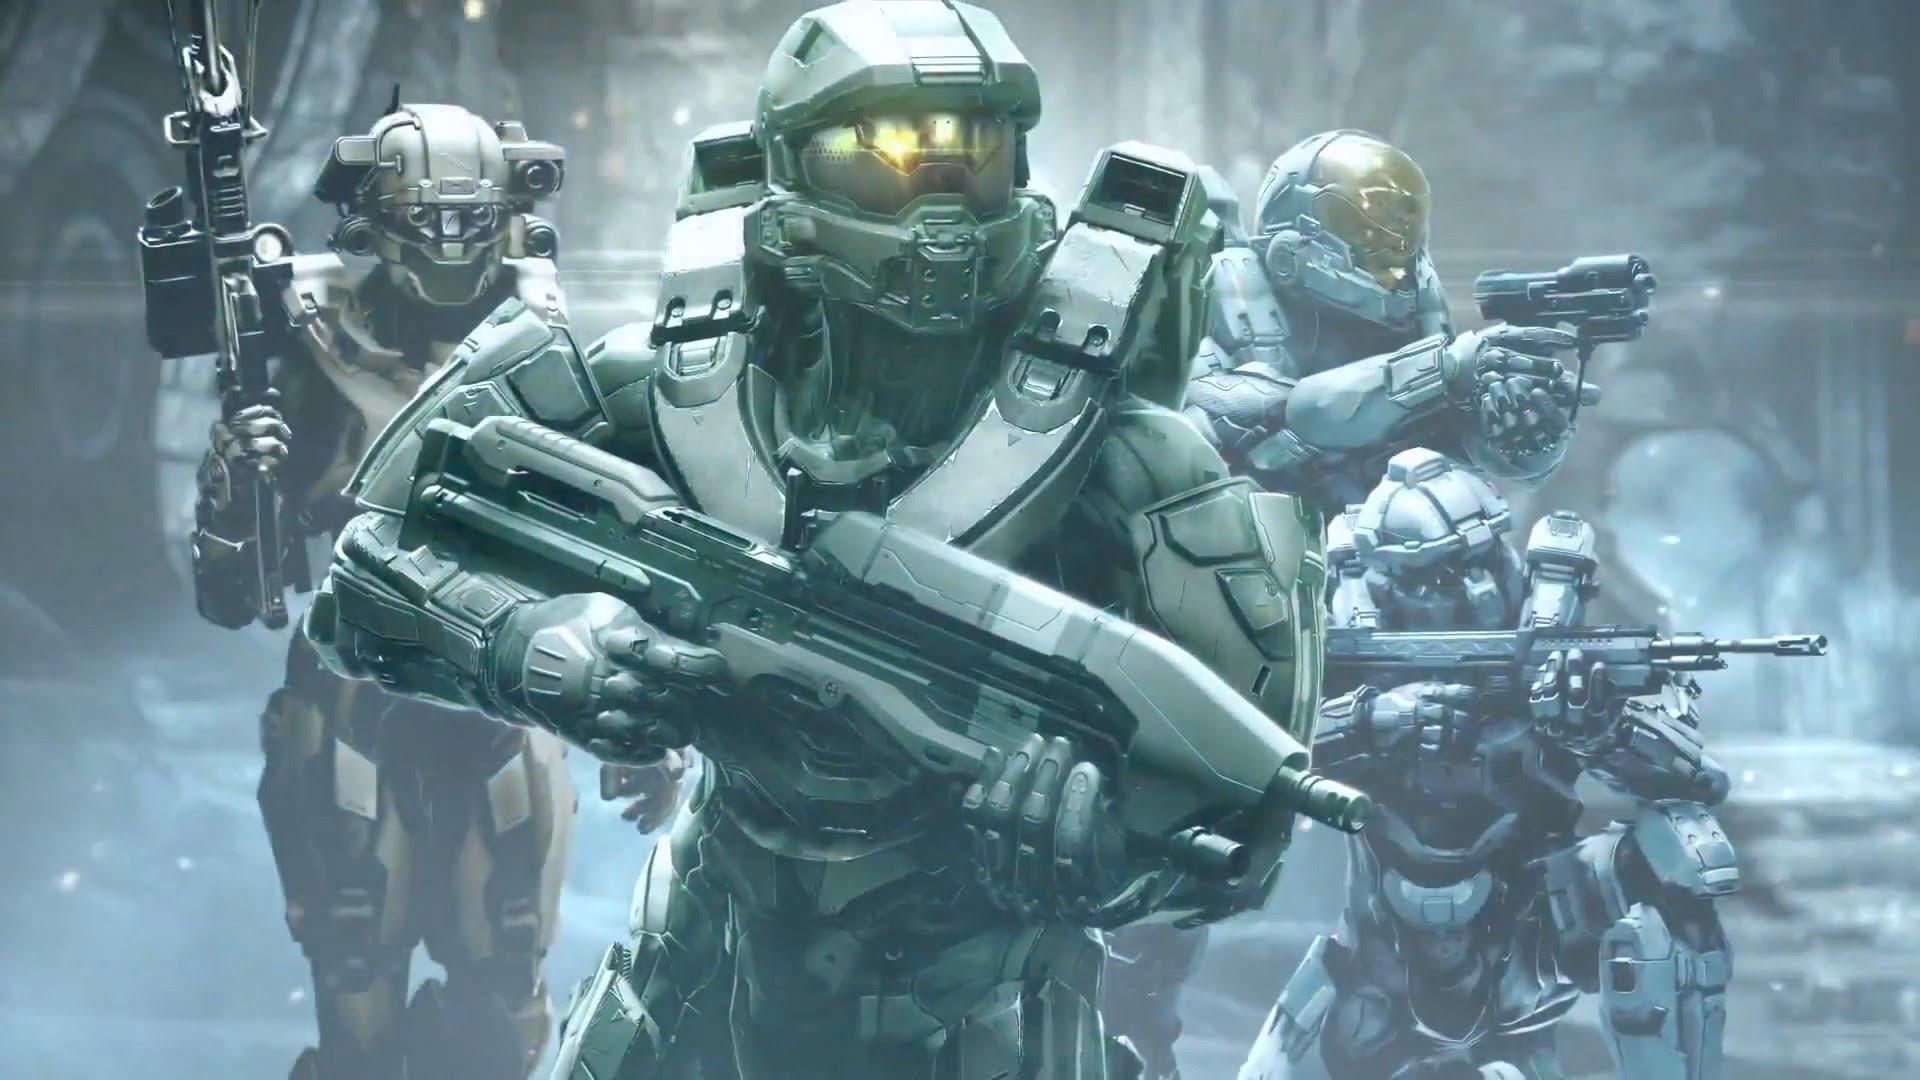 Microsoft's E3 plans don't include Halo 6 screenshot